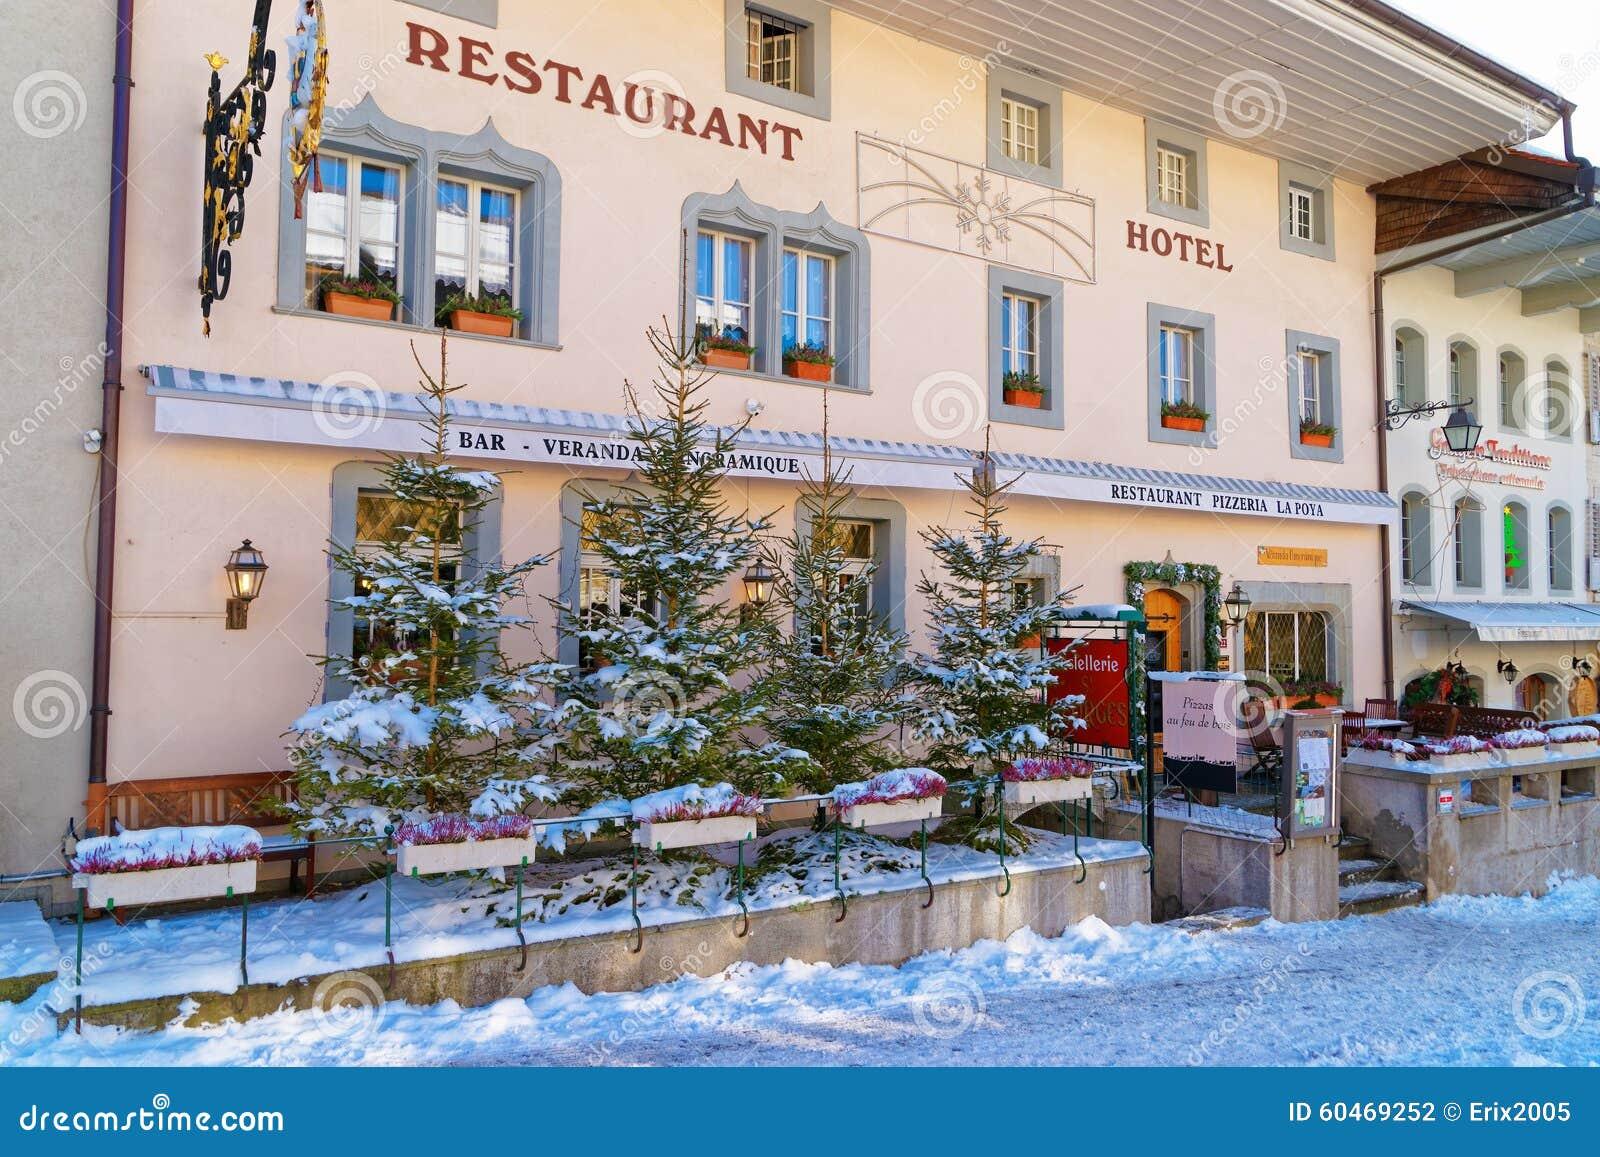 Photos De Verandas En Bois cozy restaurant in the swiss village gruyeres editorial